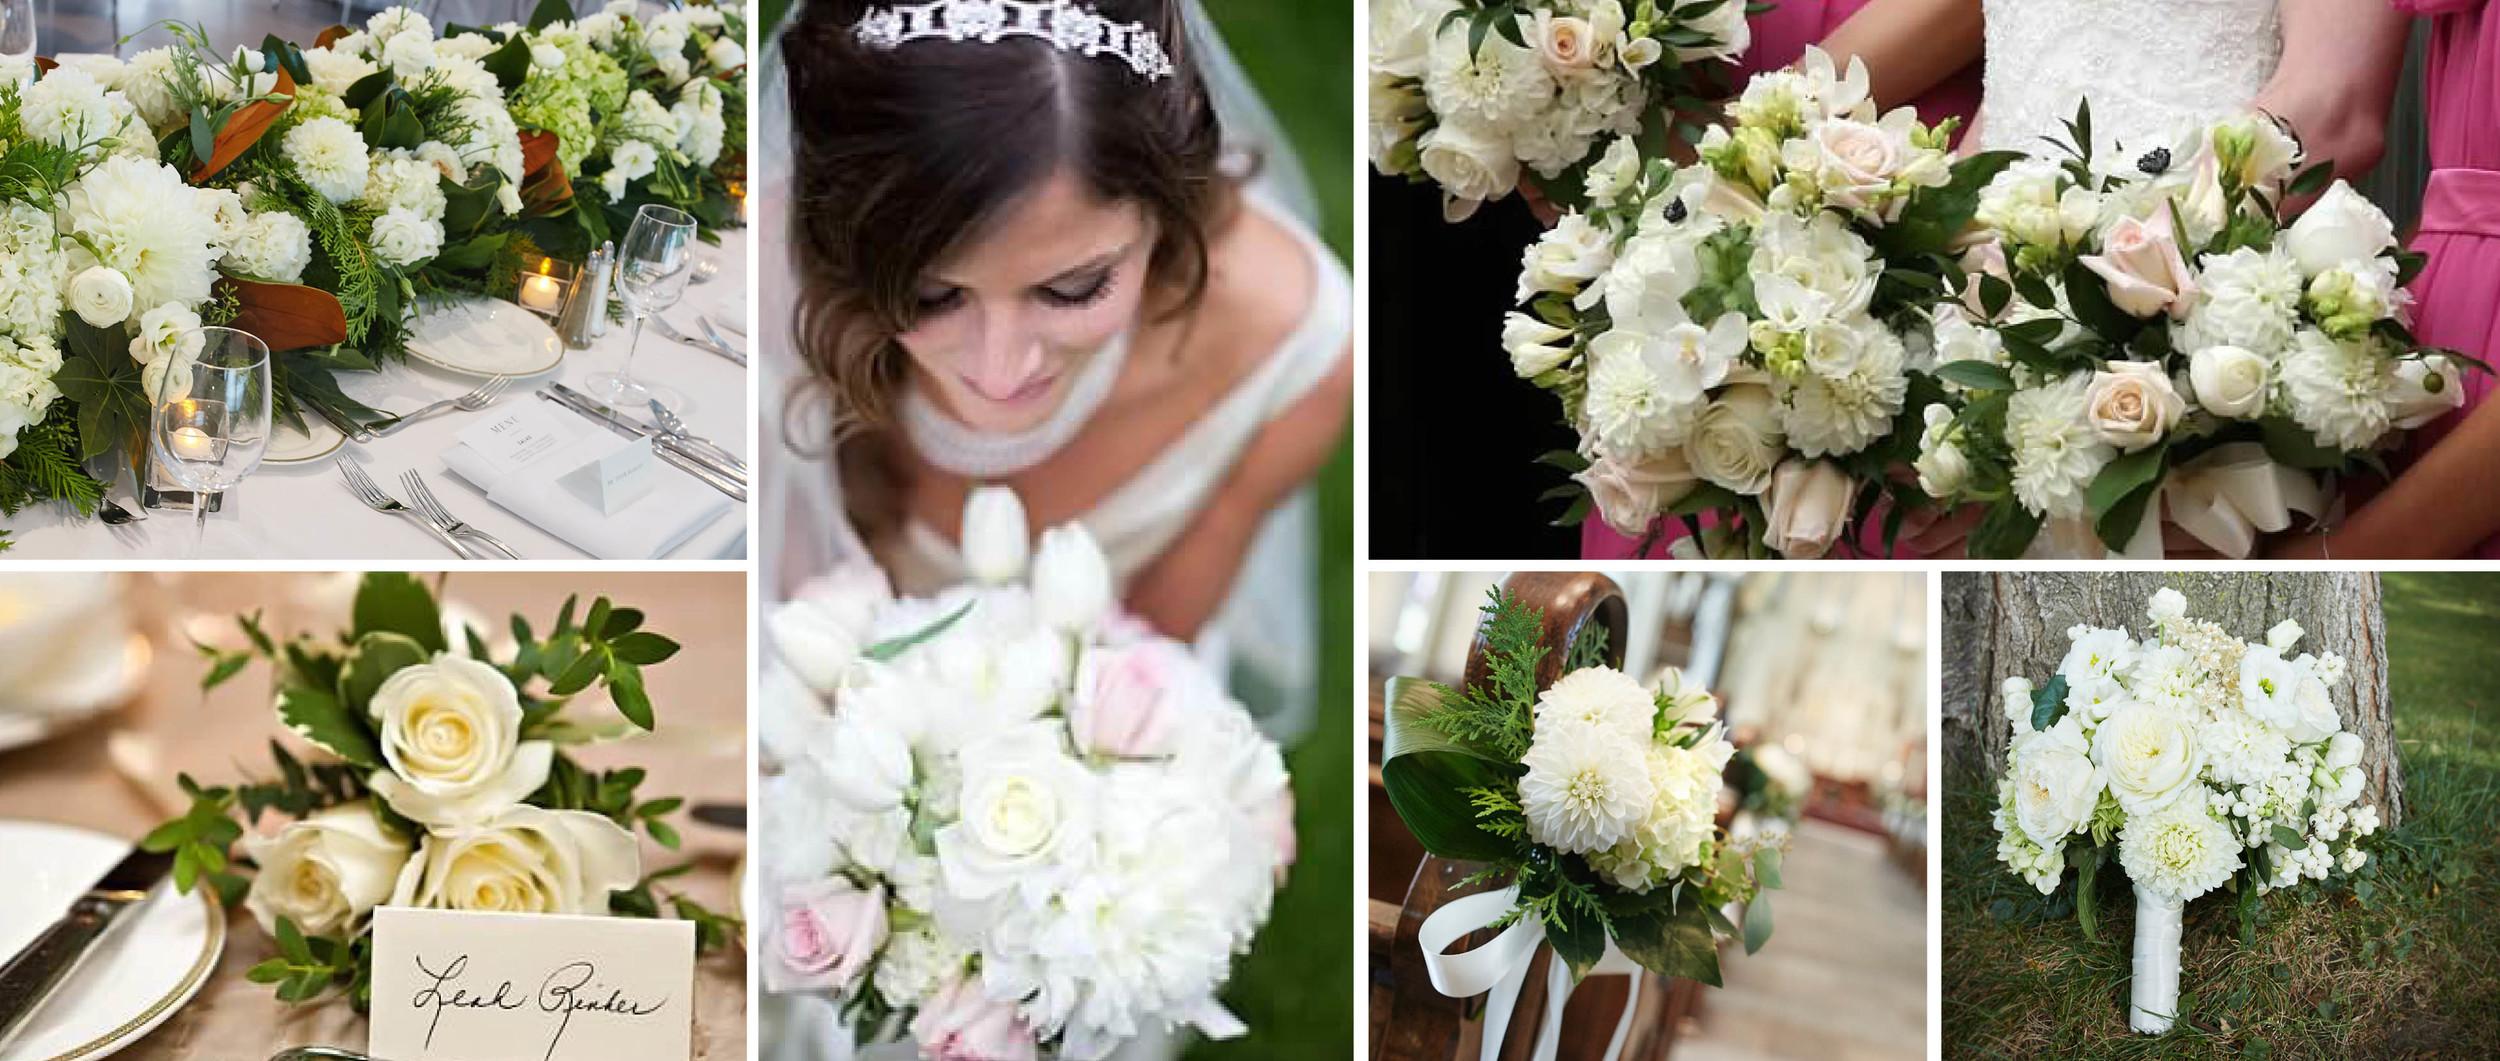 Wedding collage1.jpg